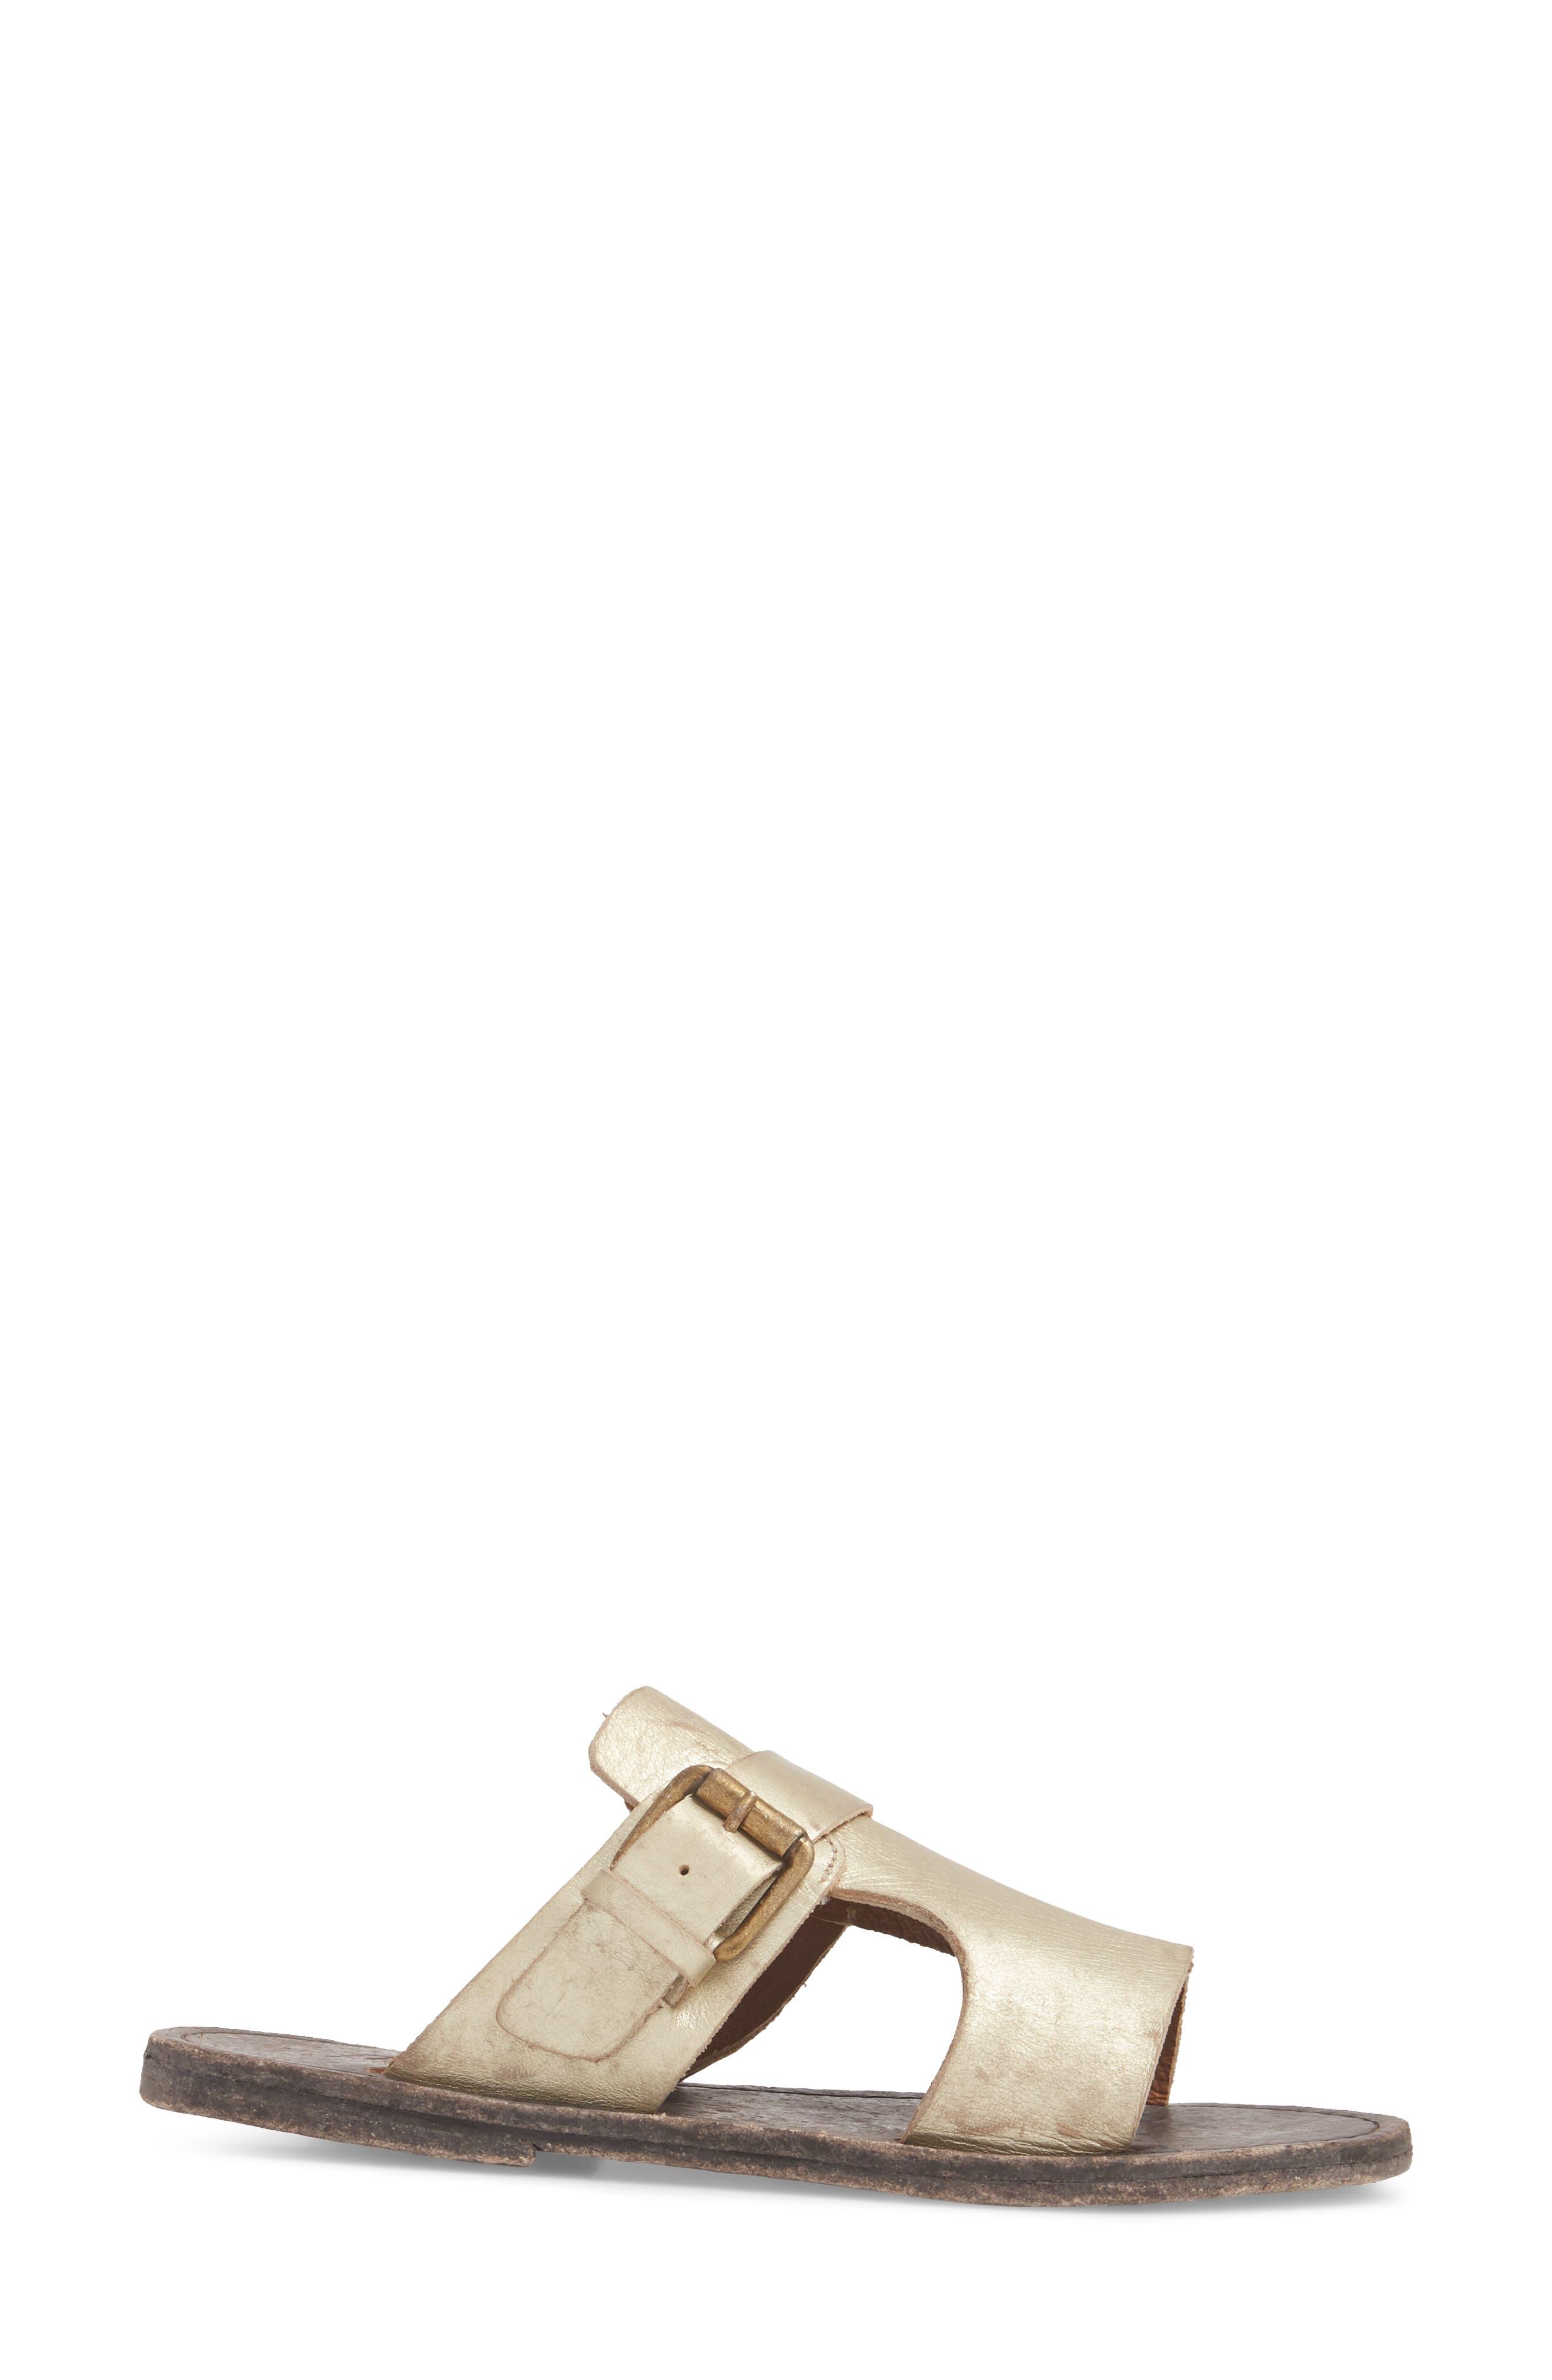 Abbie Slide Sandal,                             Alternate thumbnail 3, color,                             Gold Leather